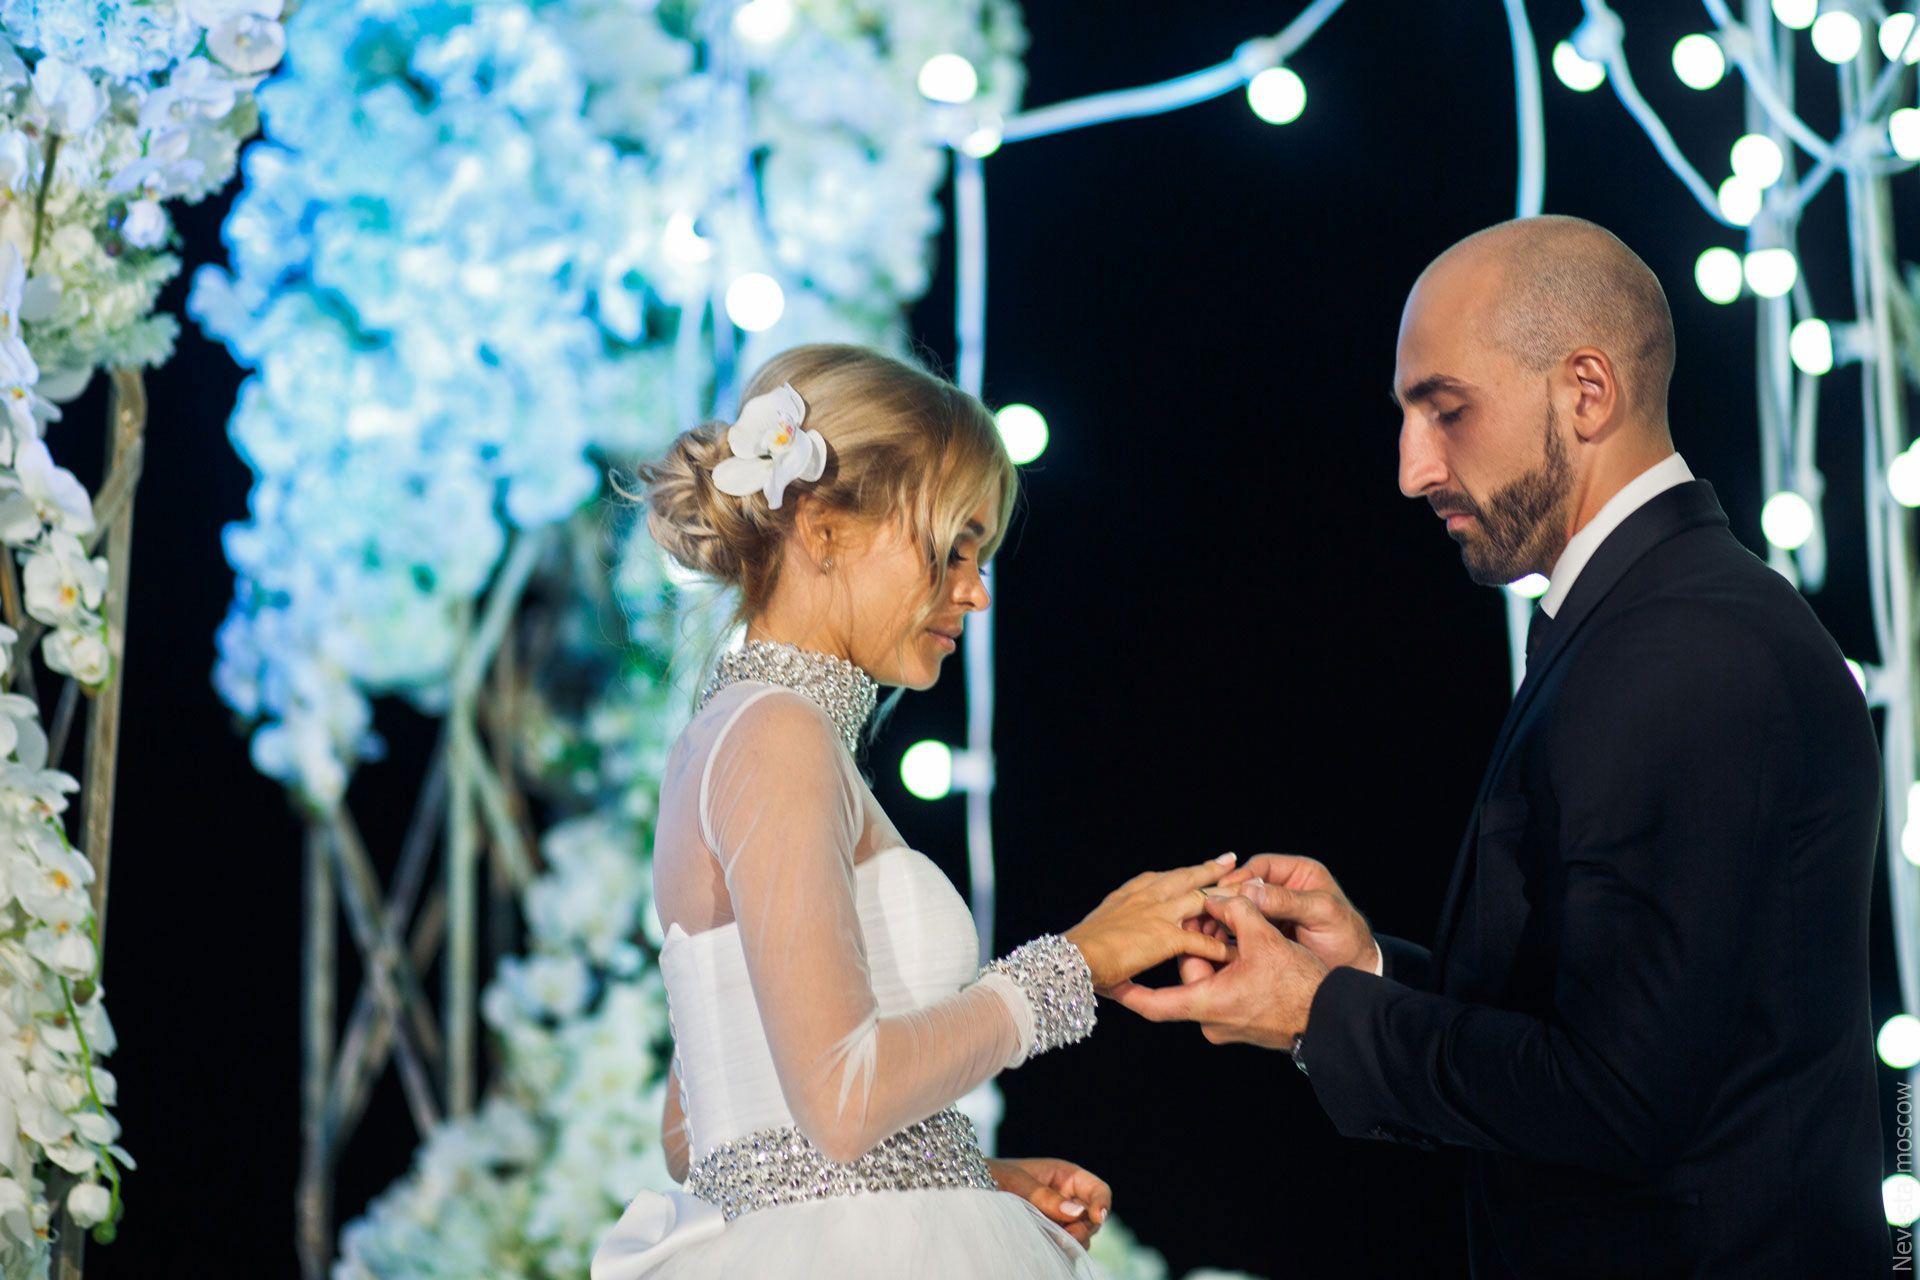 Свадьба Анны Хилькевич и Артура Волкова, фото 16